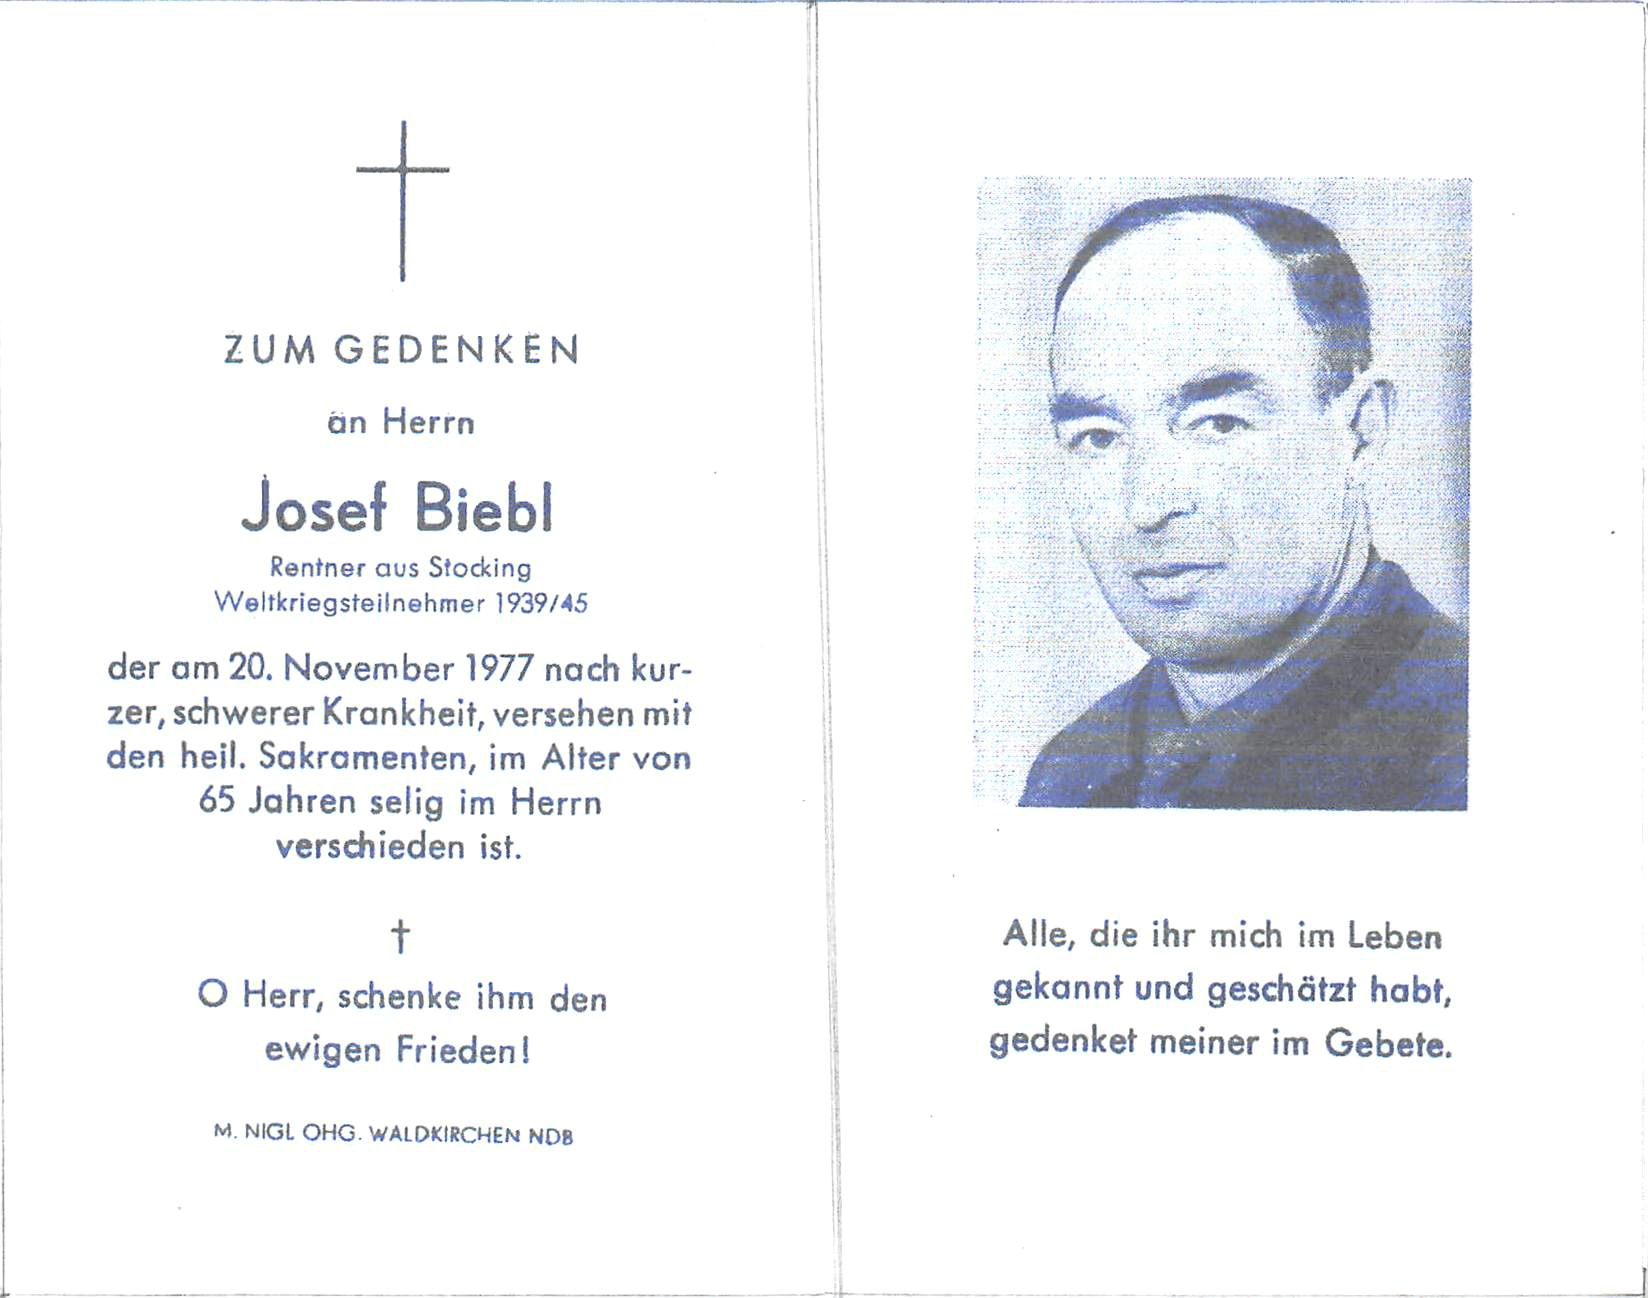 1977-11-20-Biebl-Josef-Stocking-Rentner